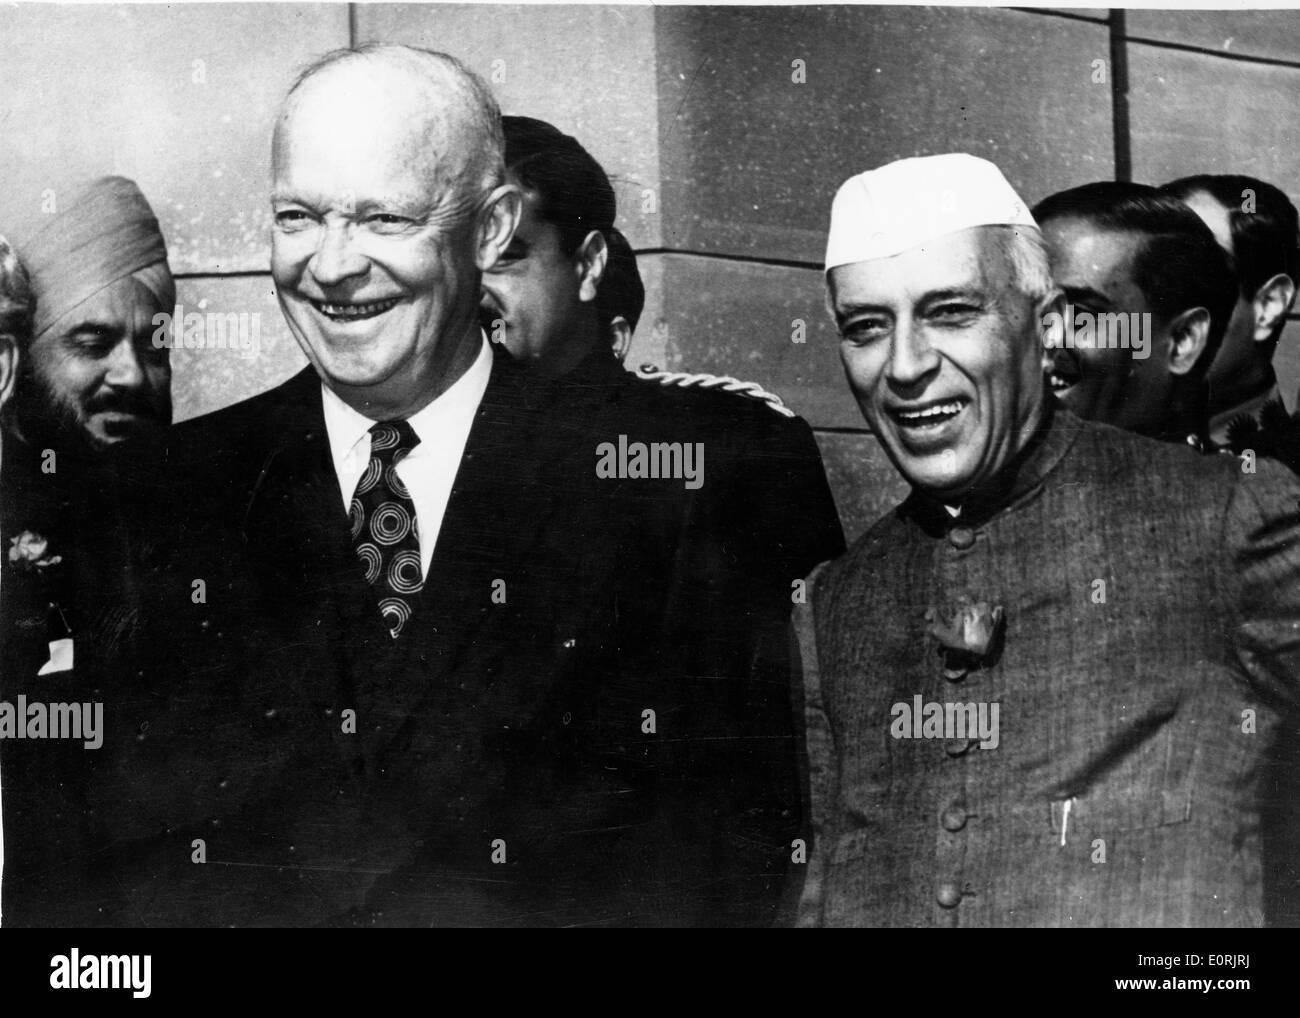 President Eisenhower with Jawaharlal Nehru - Stock Image